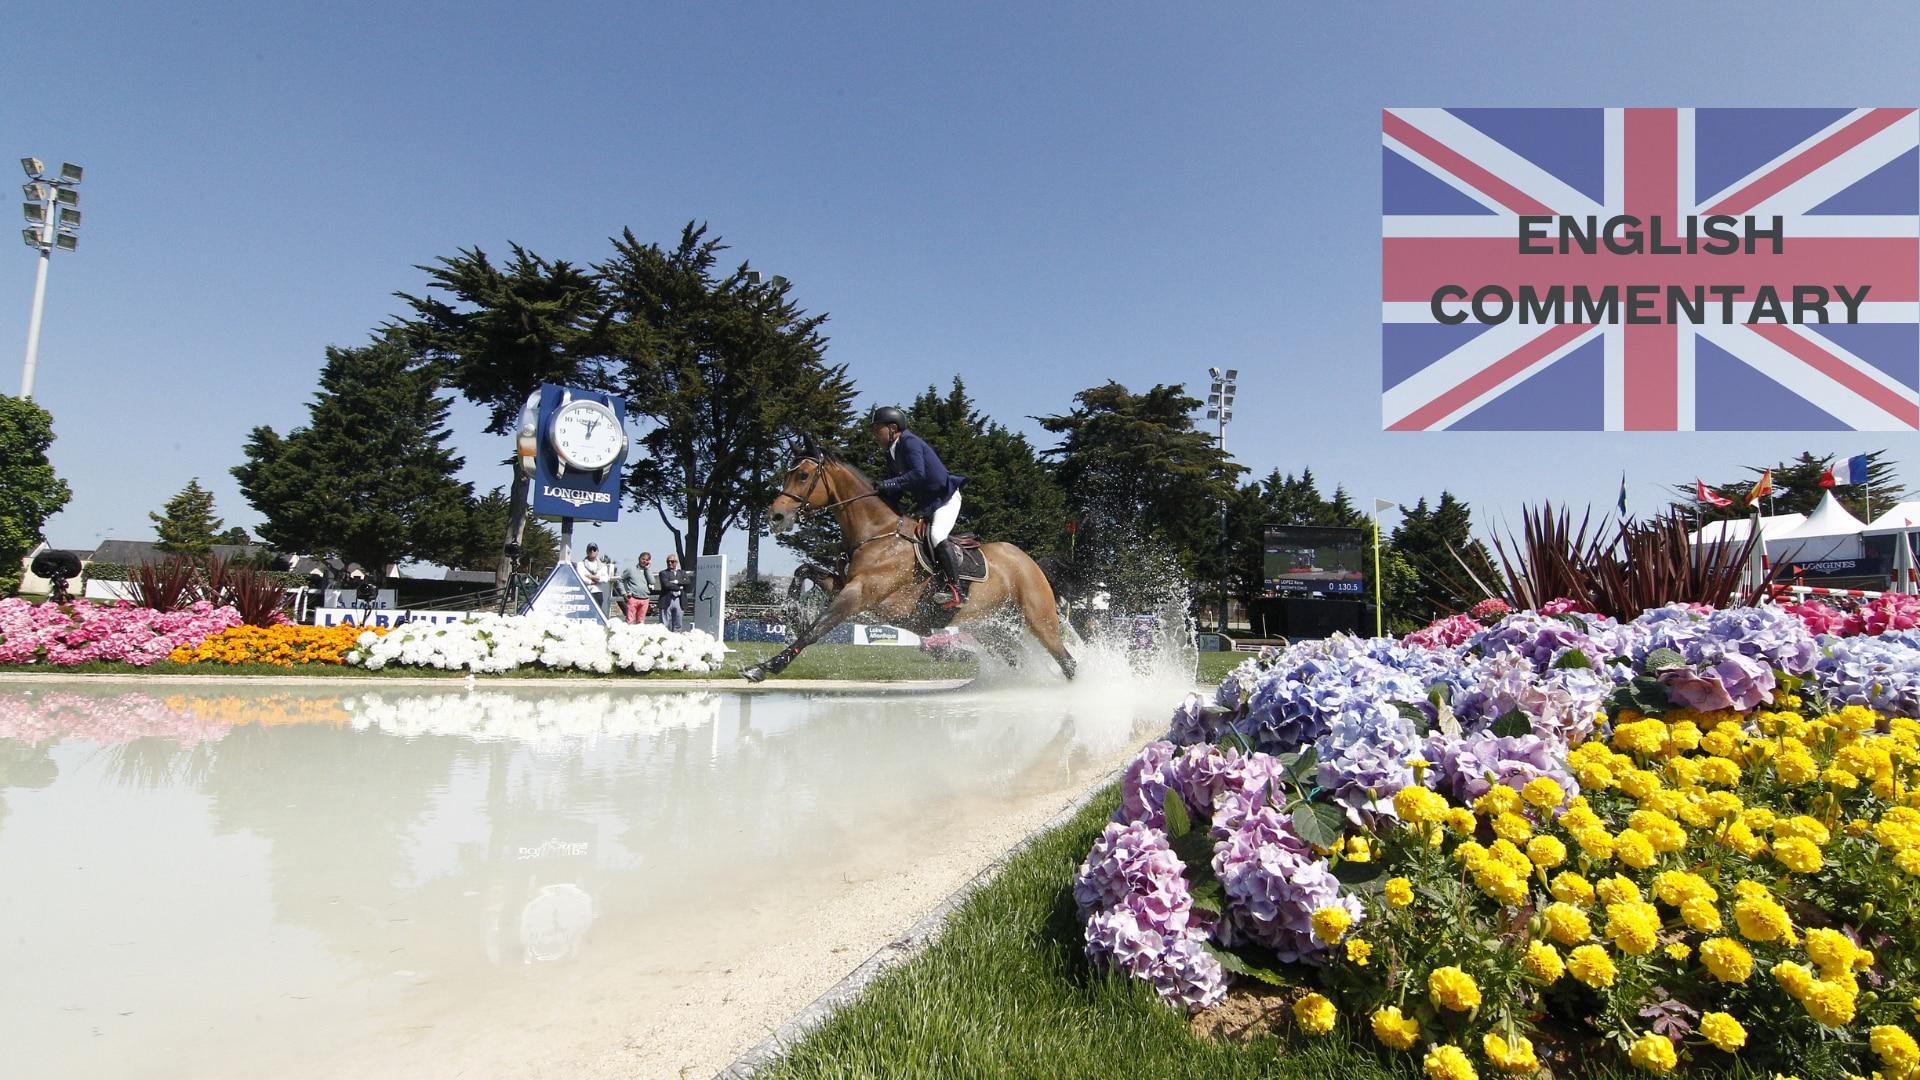 International Jumping La Baule 2021, English